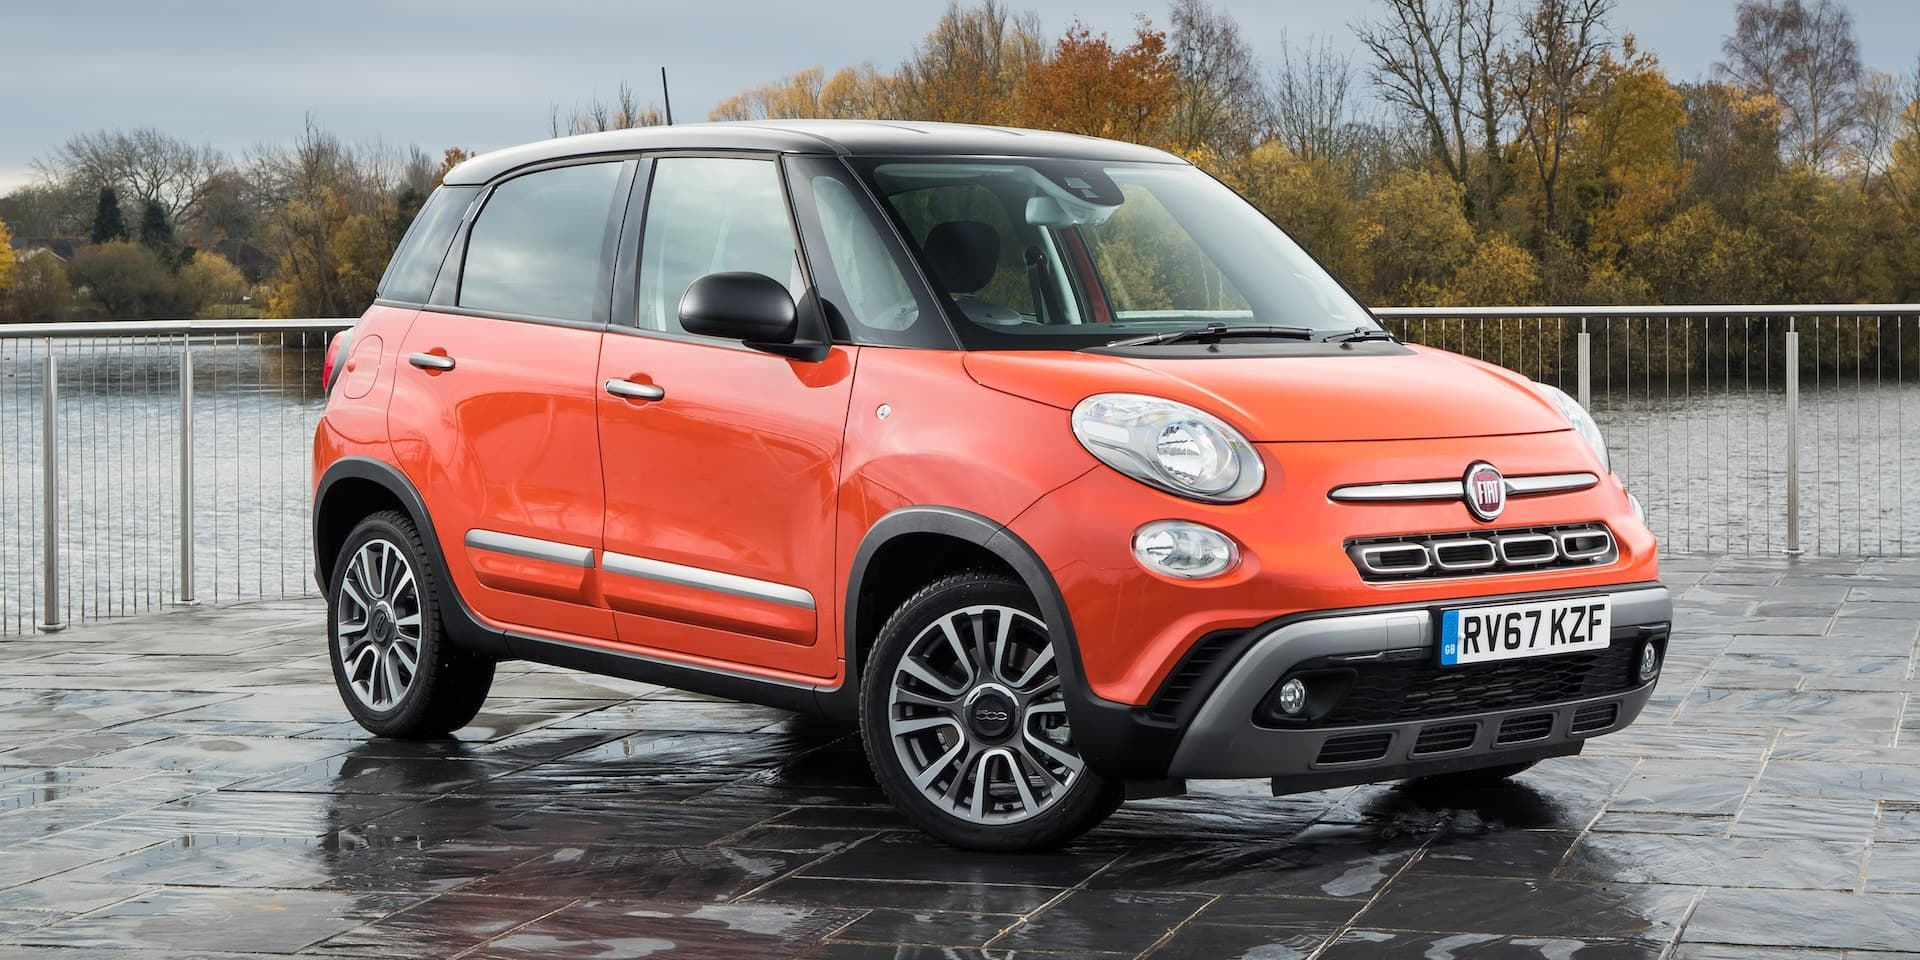 Fiat 500L (2013 onwards) – Expert Rating